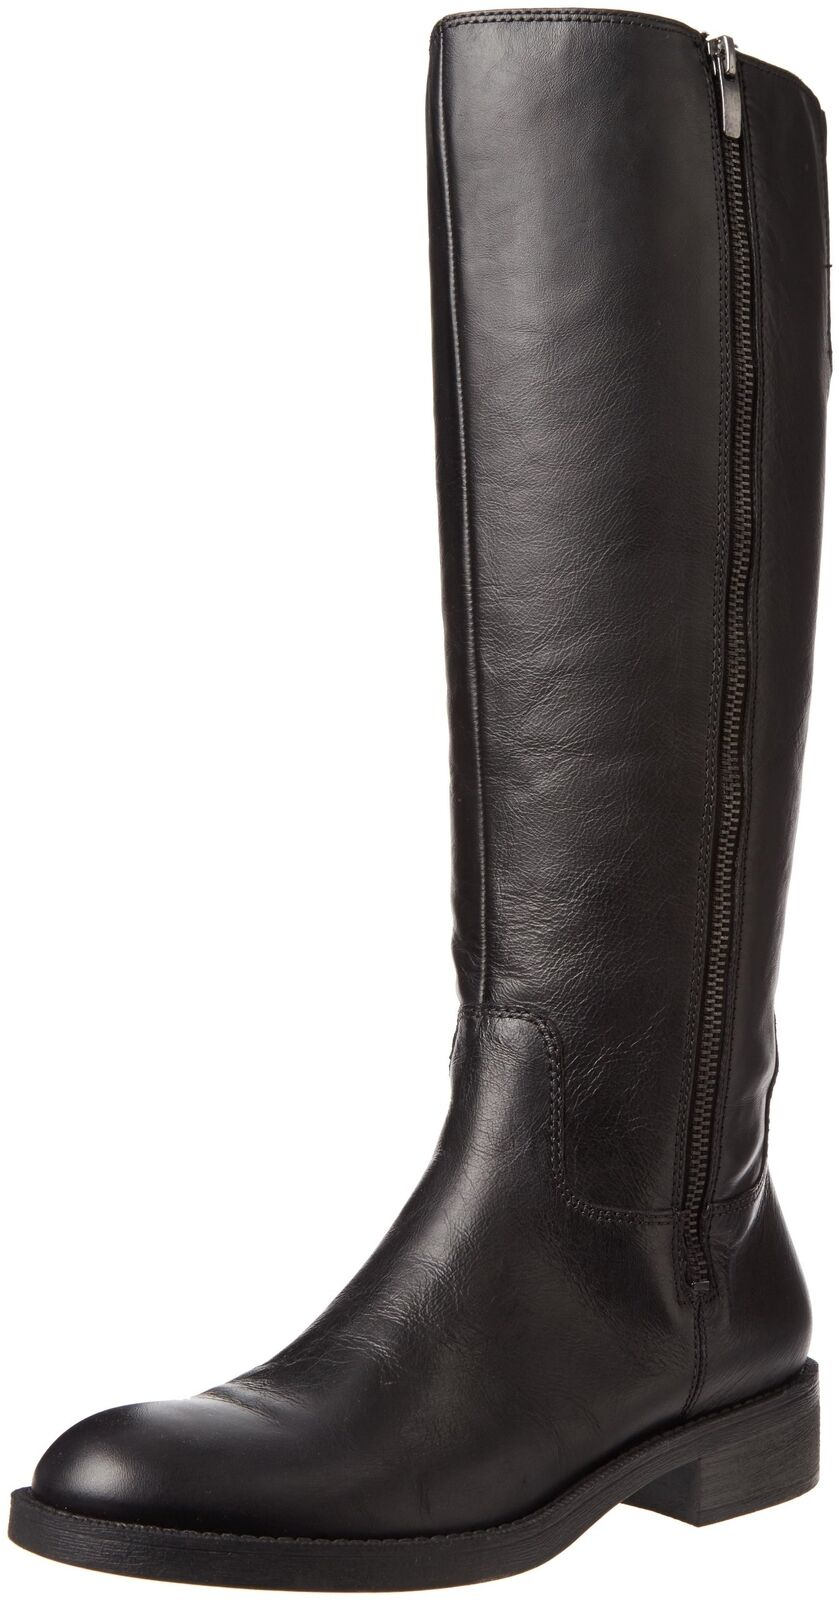 Enzo Angiolini Women's Shobi Riding Boot Black Leather 6.5 B(M) US